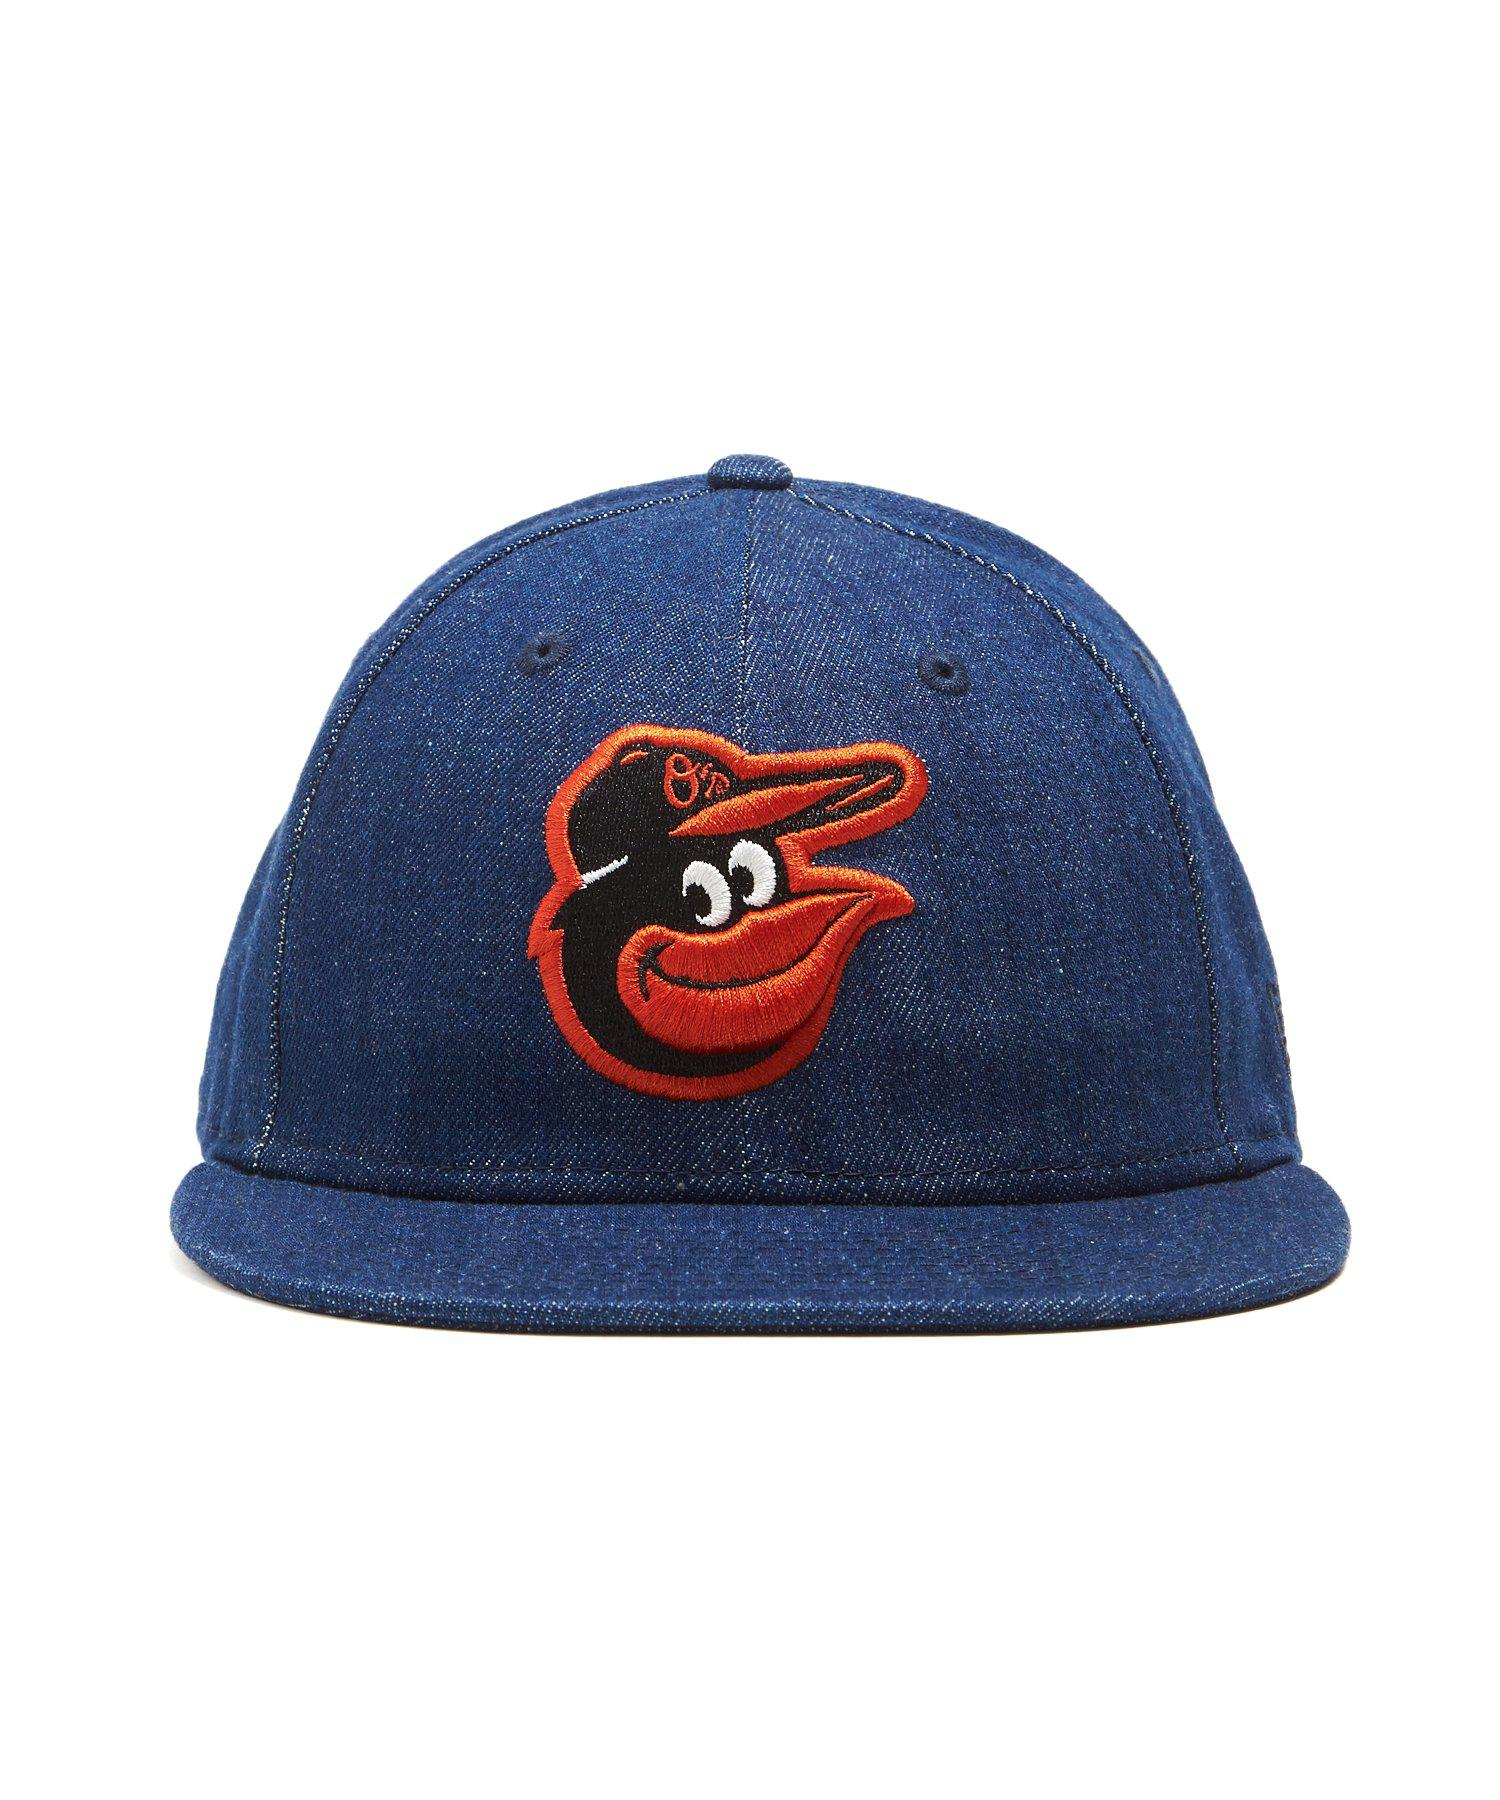 new arrival 5dd4f 225cc NEW ERA HATS Mlb Baltimore Orioles Cap In Cone Denim in Blue for Men - Lyst